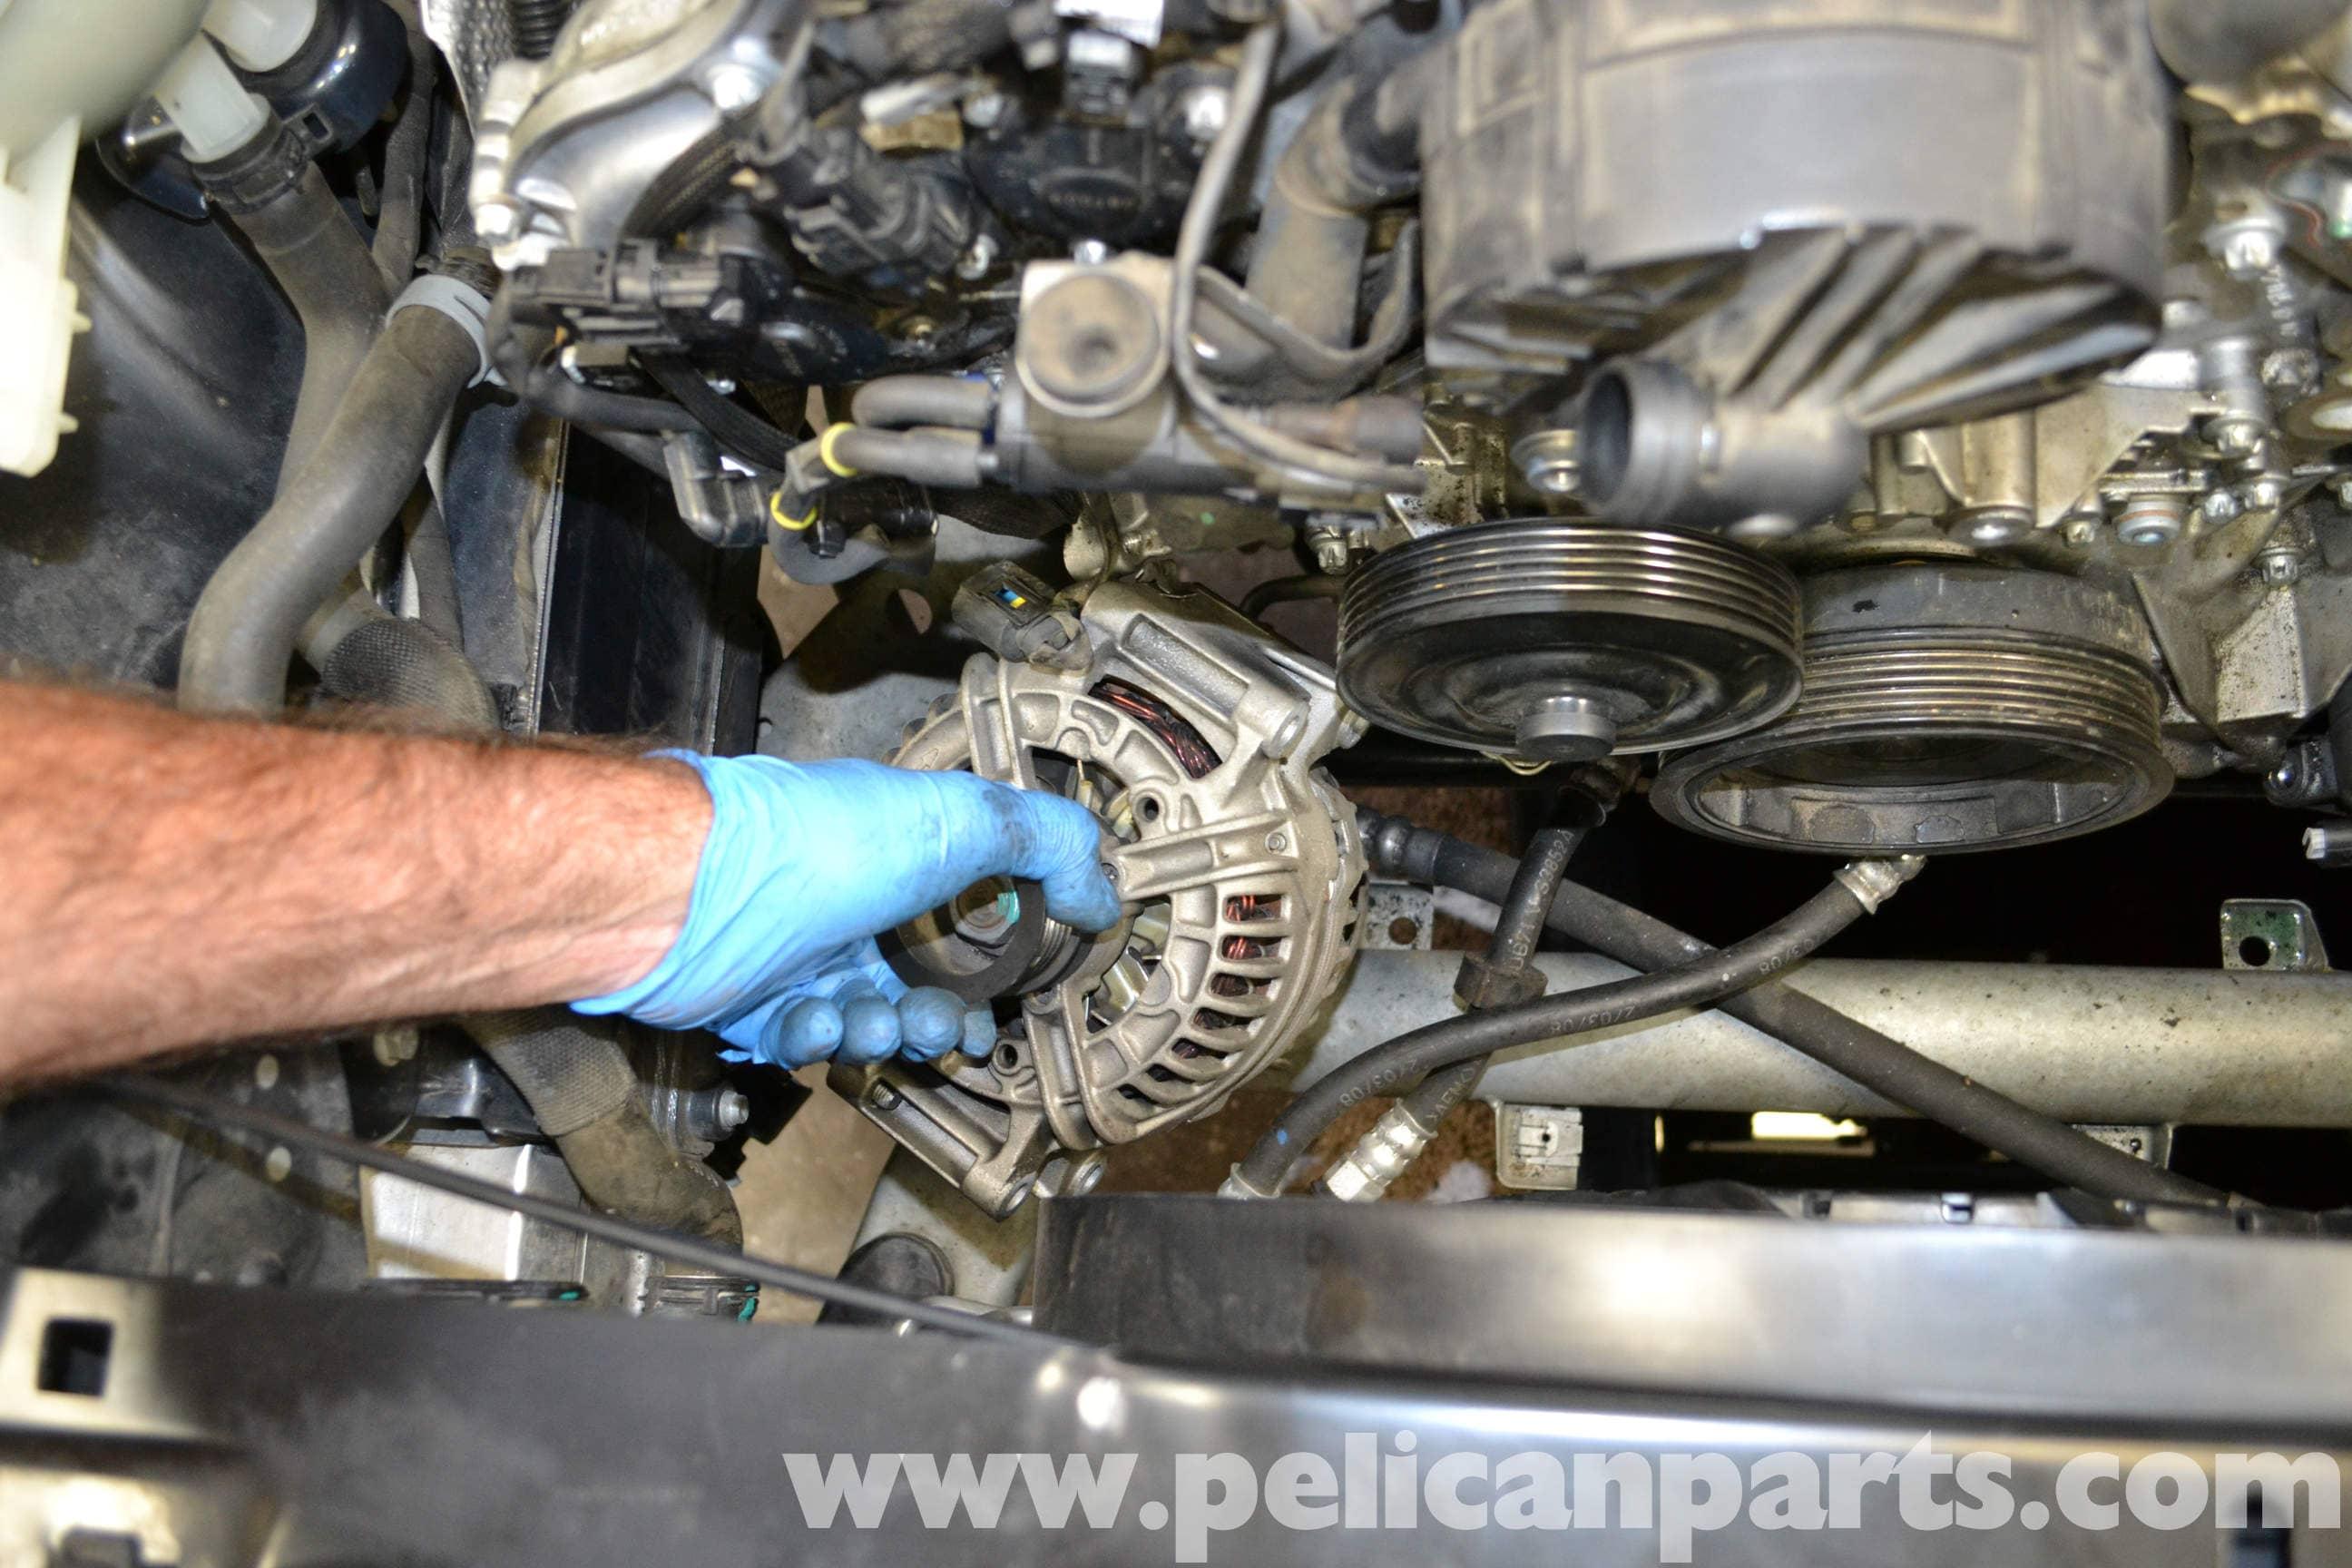 Mercedes-Benz W204 Voltage Regulator Replacement - (2008